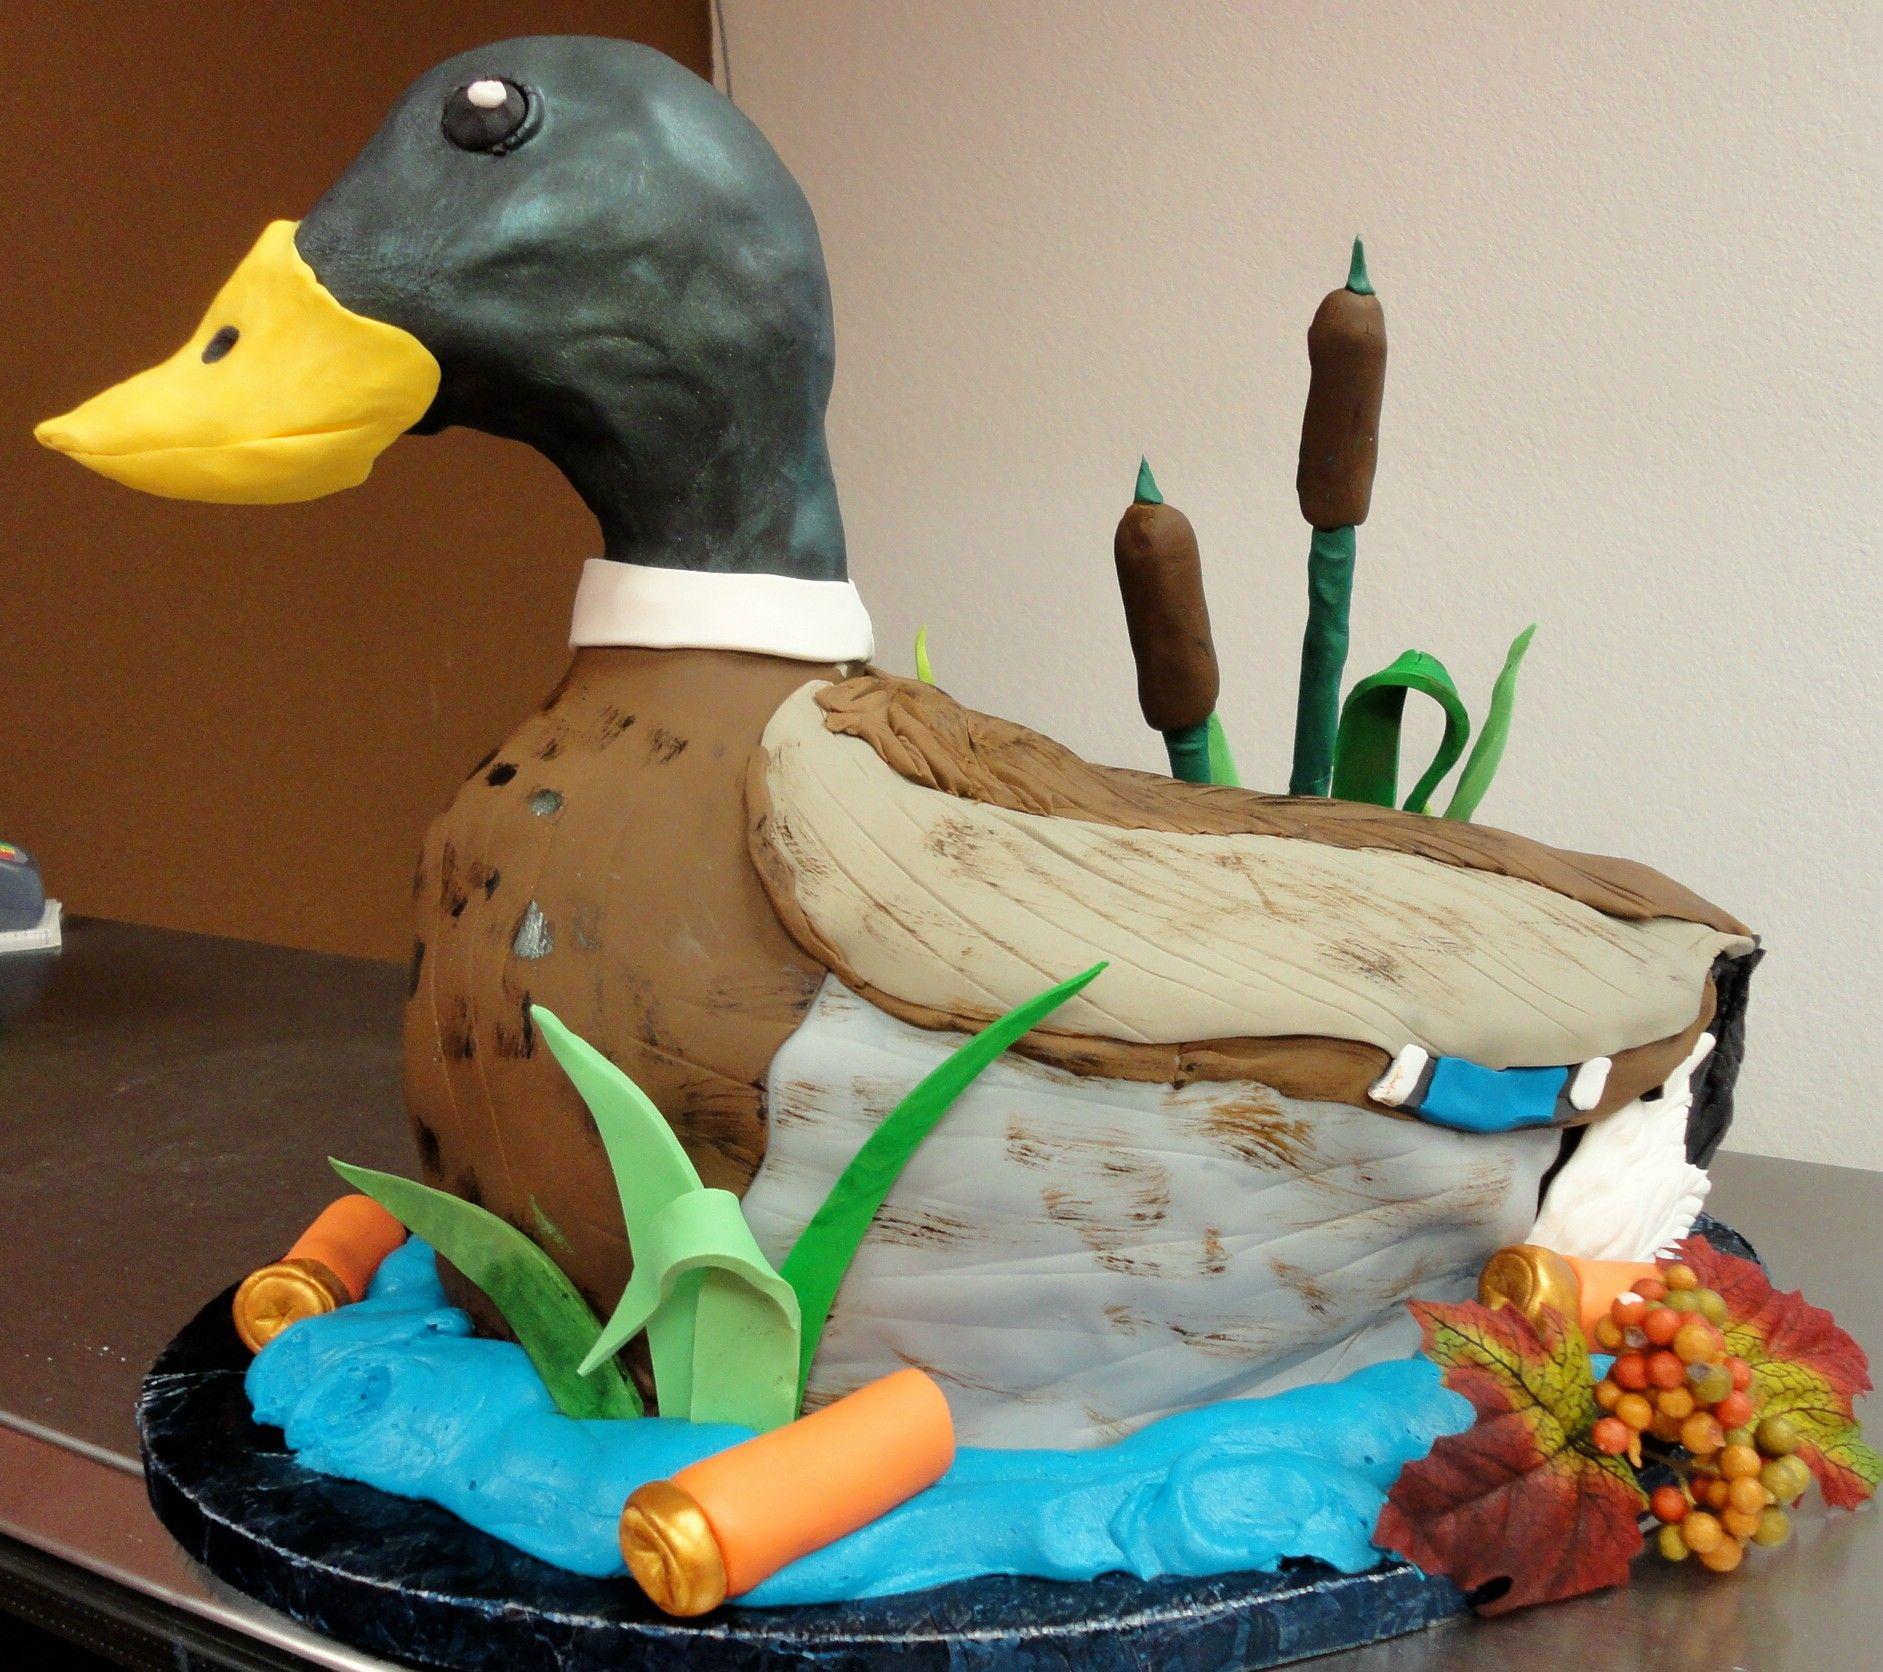 mallard duck grooms cake by slice custom cakes  Wedding Cakes By Slice  Duck cake Christmas